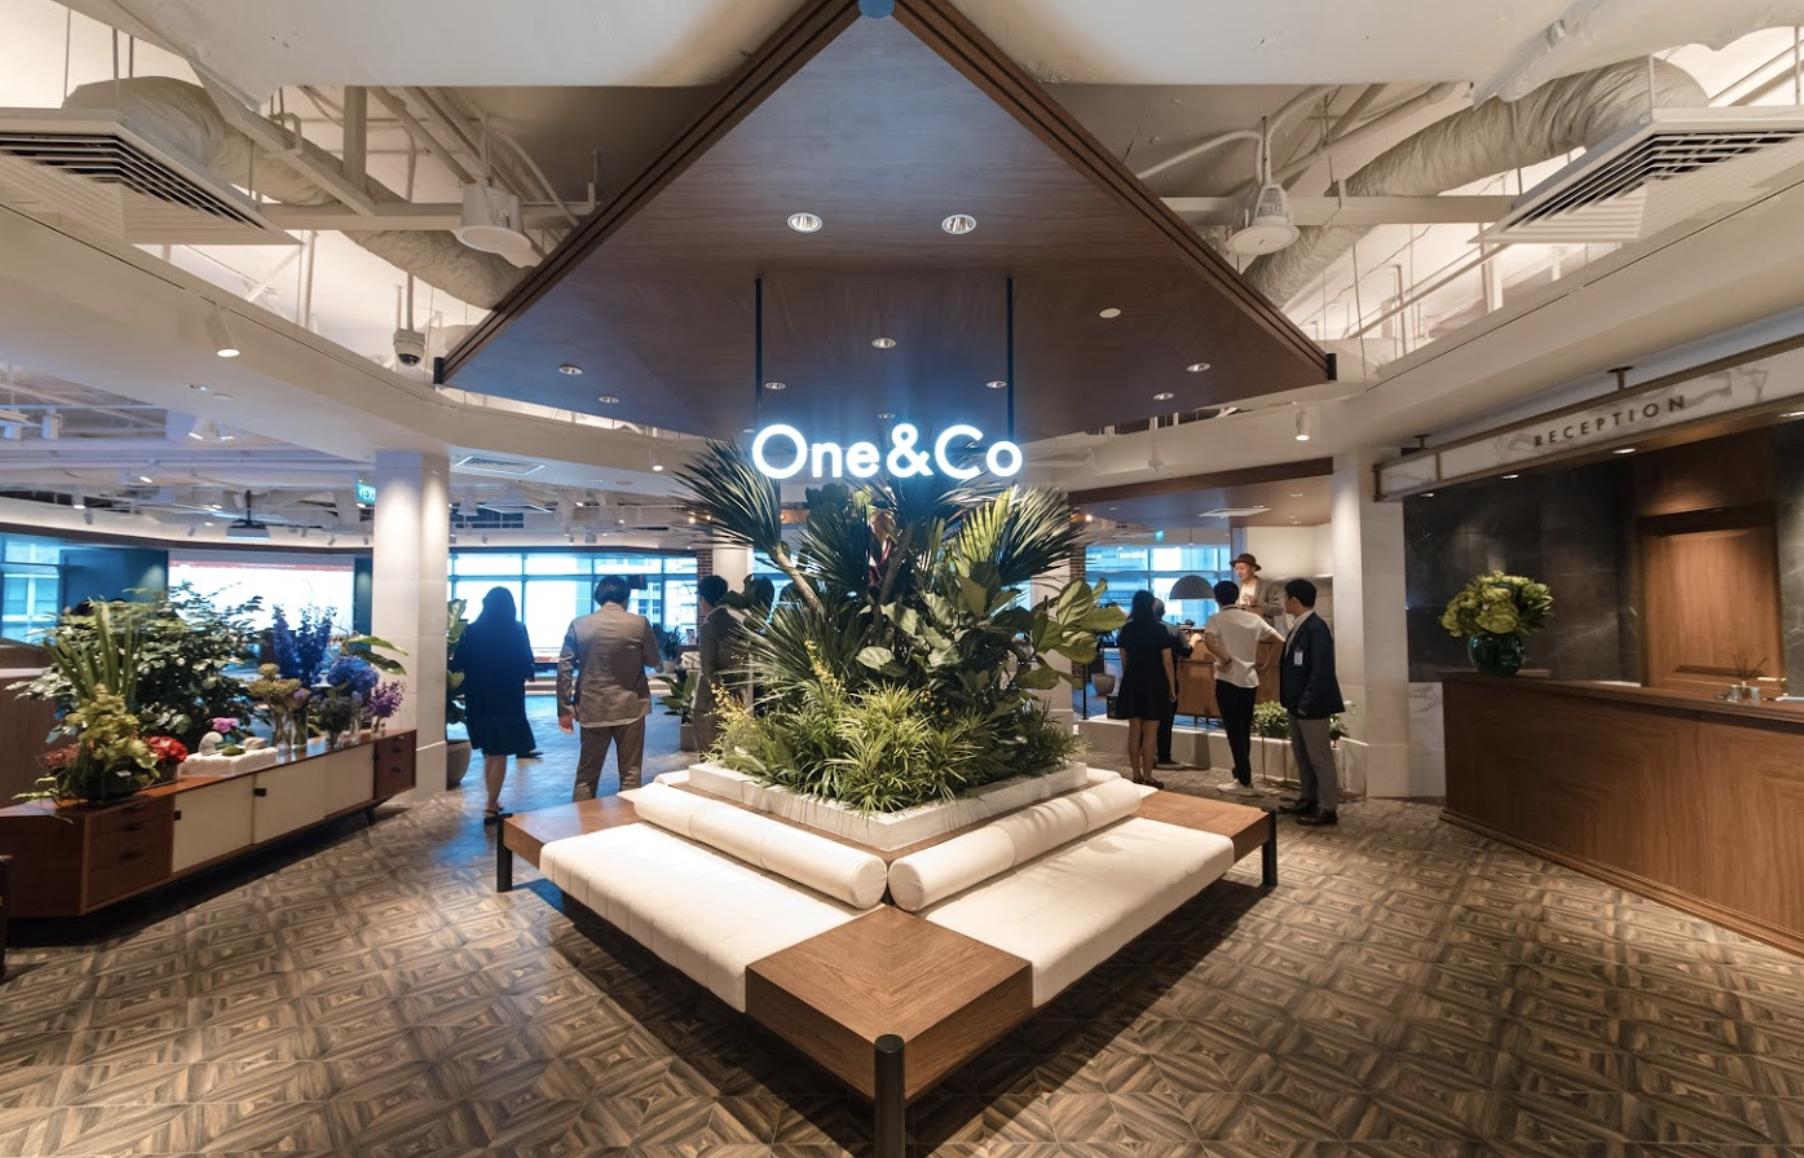 One&Co, Singapore